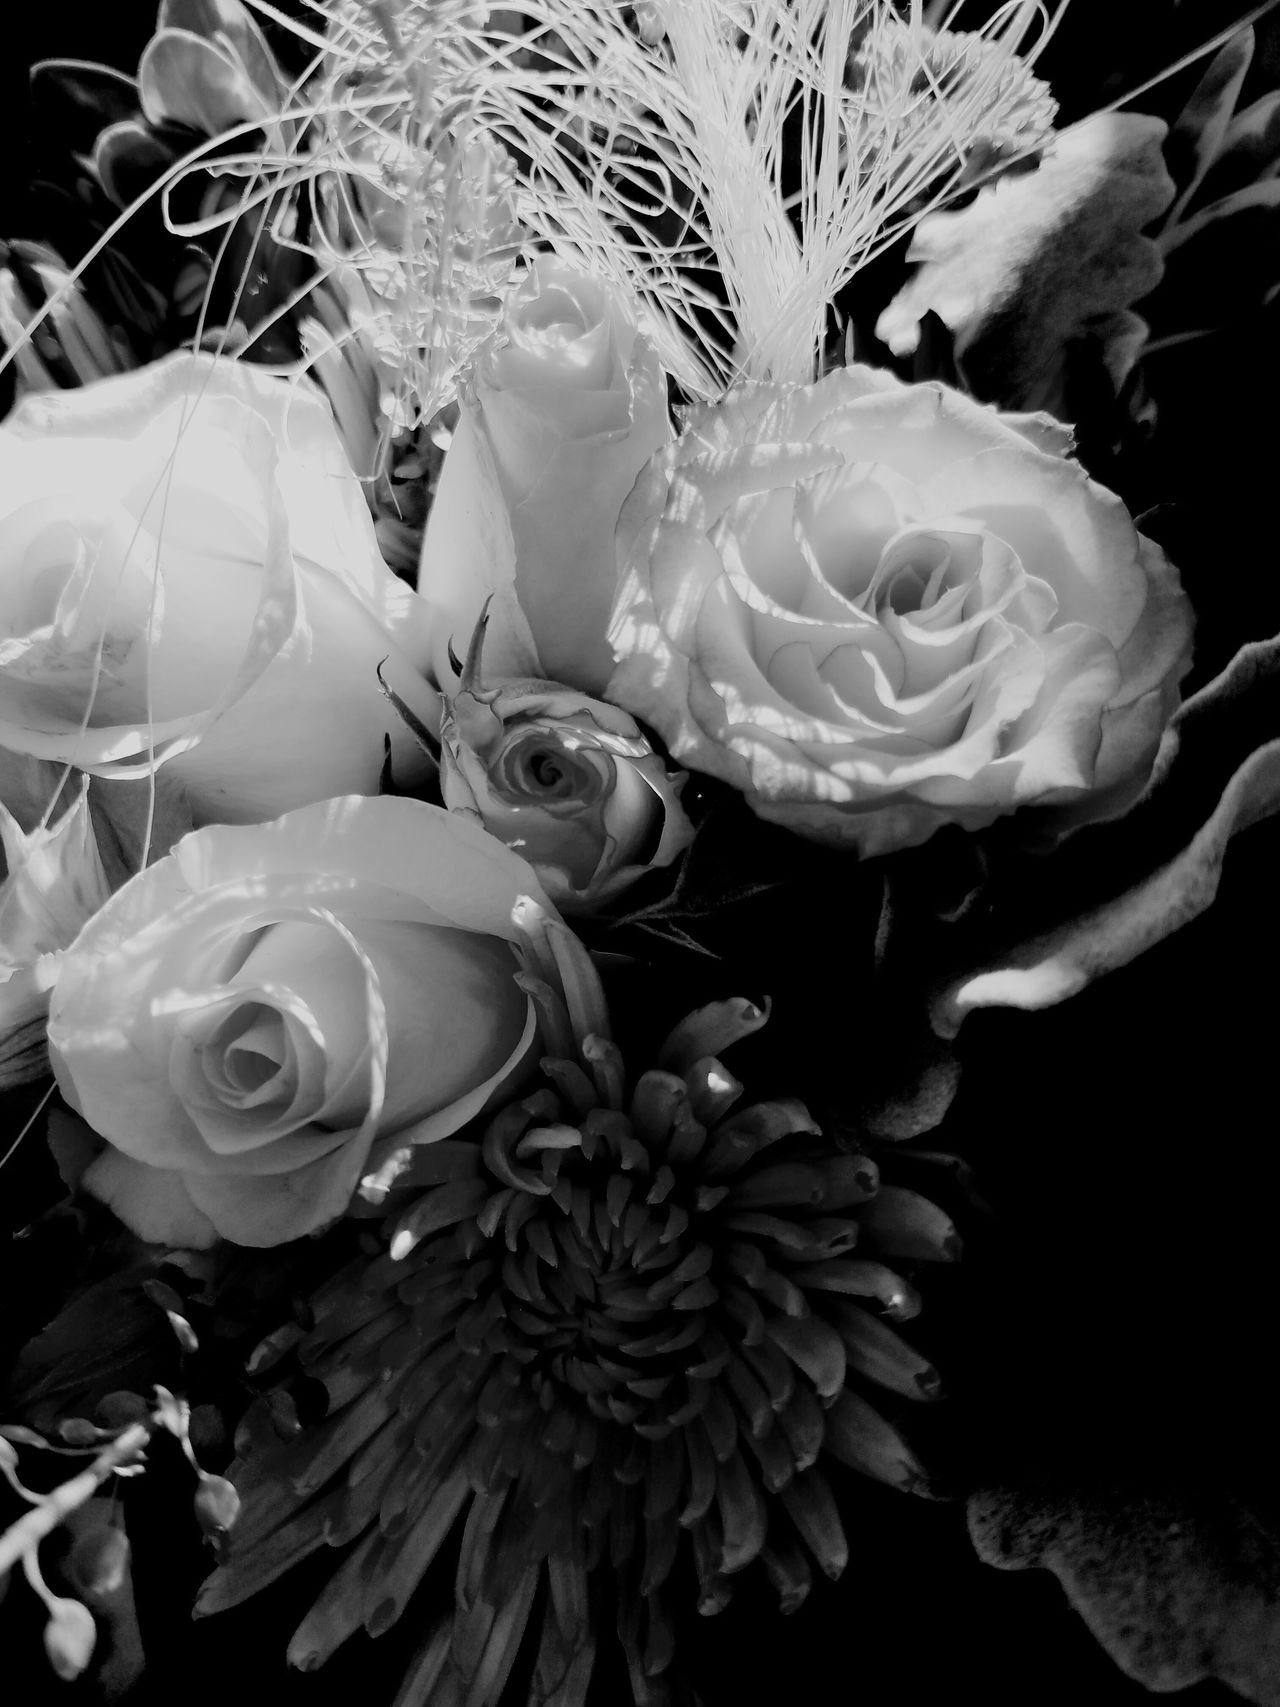 B&W Rose Bouquet B&w Botany Fine Art Fine Art Photography Flower Bouquet  Fragility MUR B&W The Song Of Light MUR On EyeEm